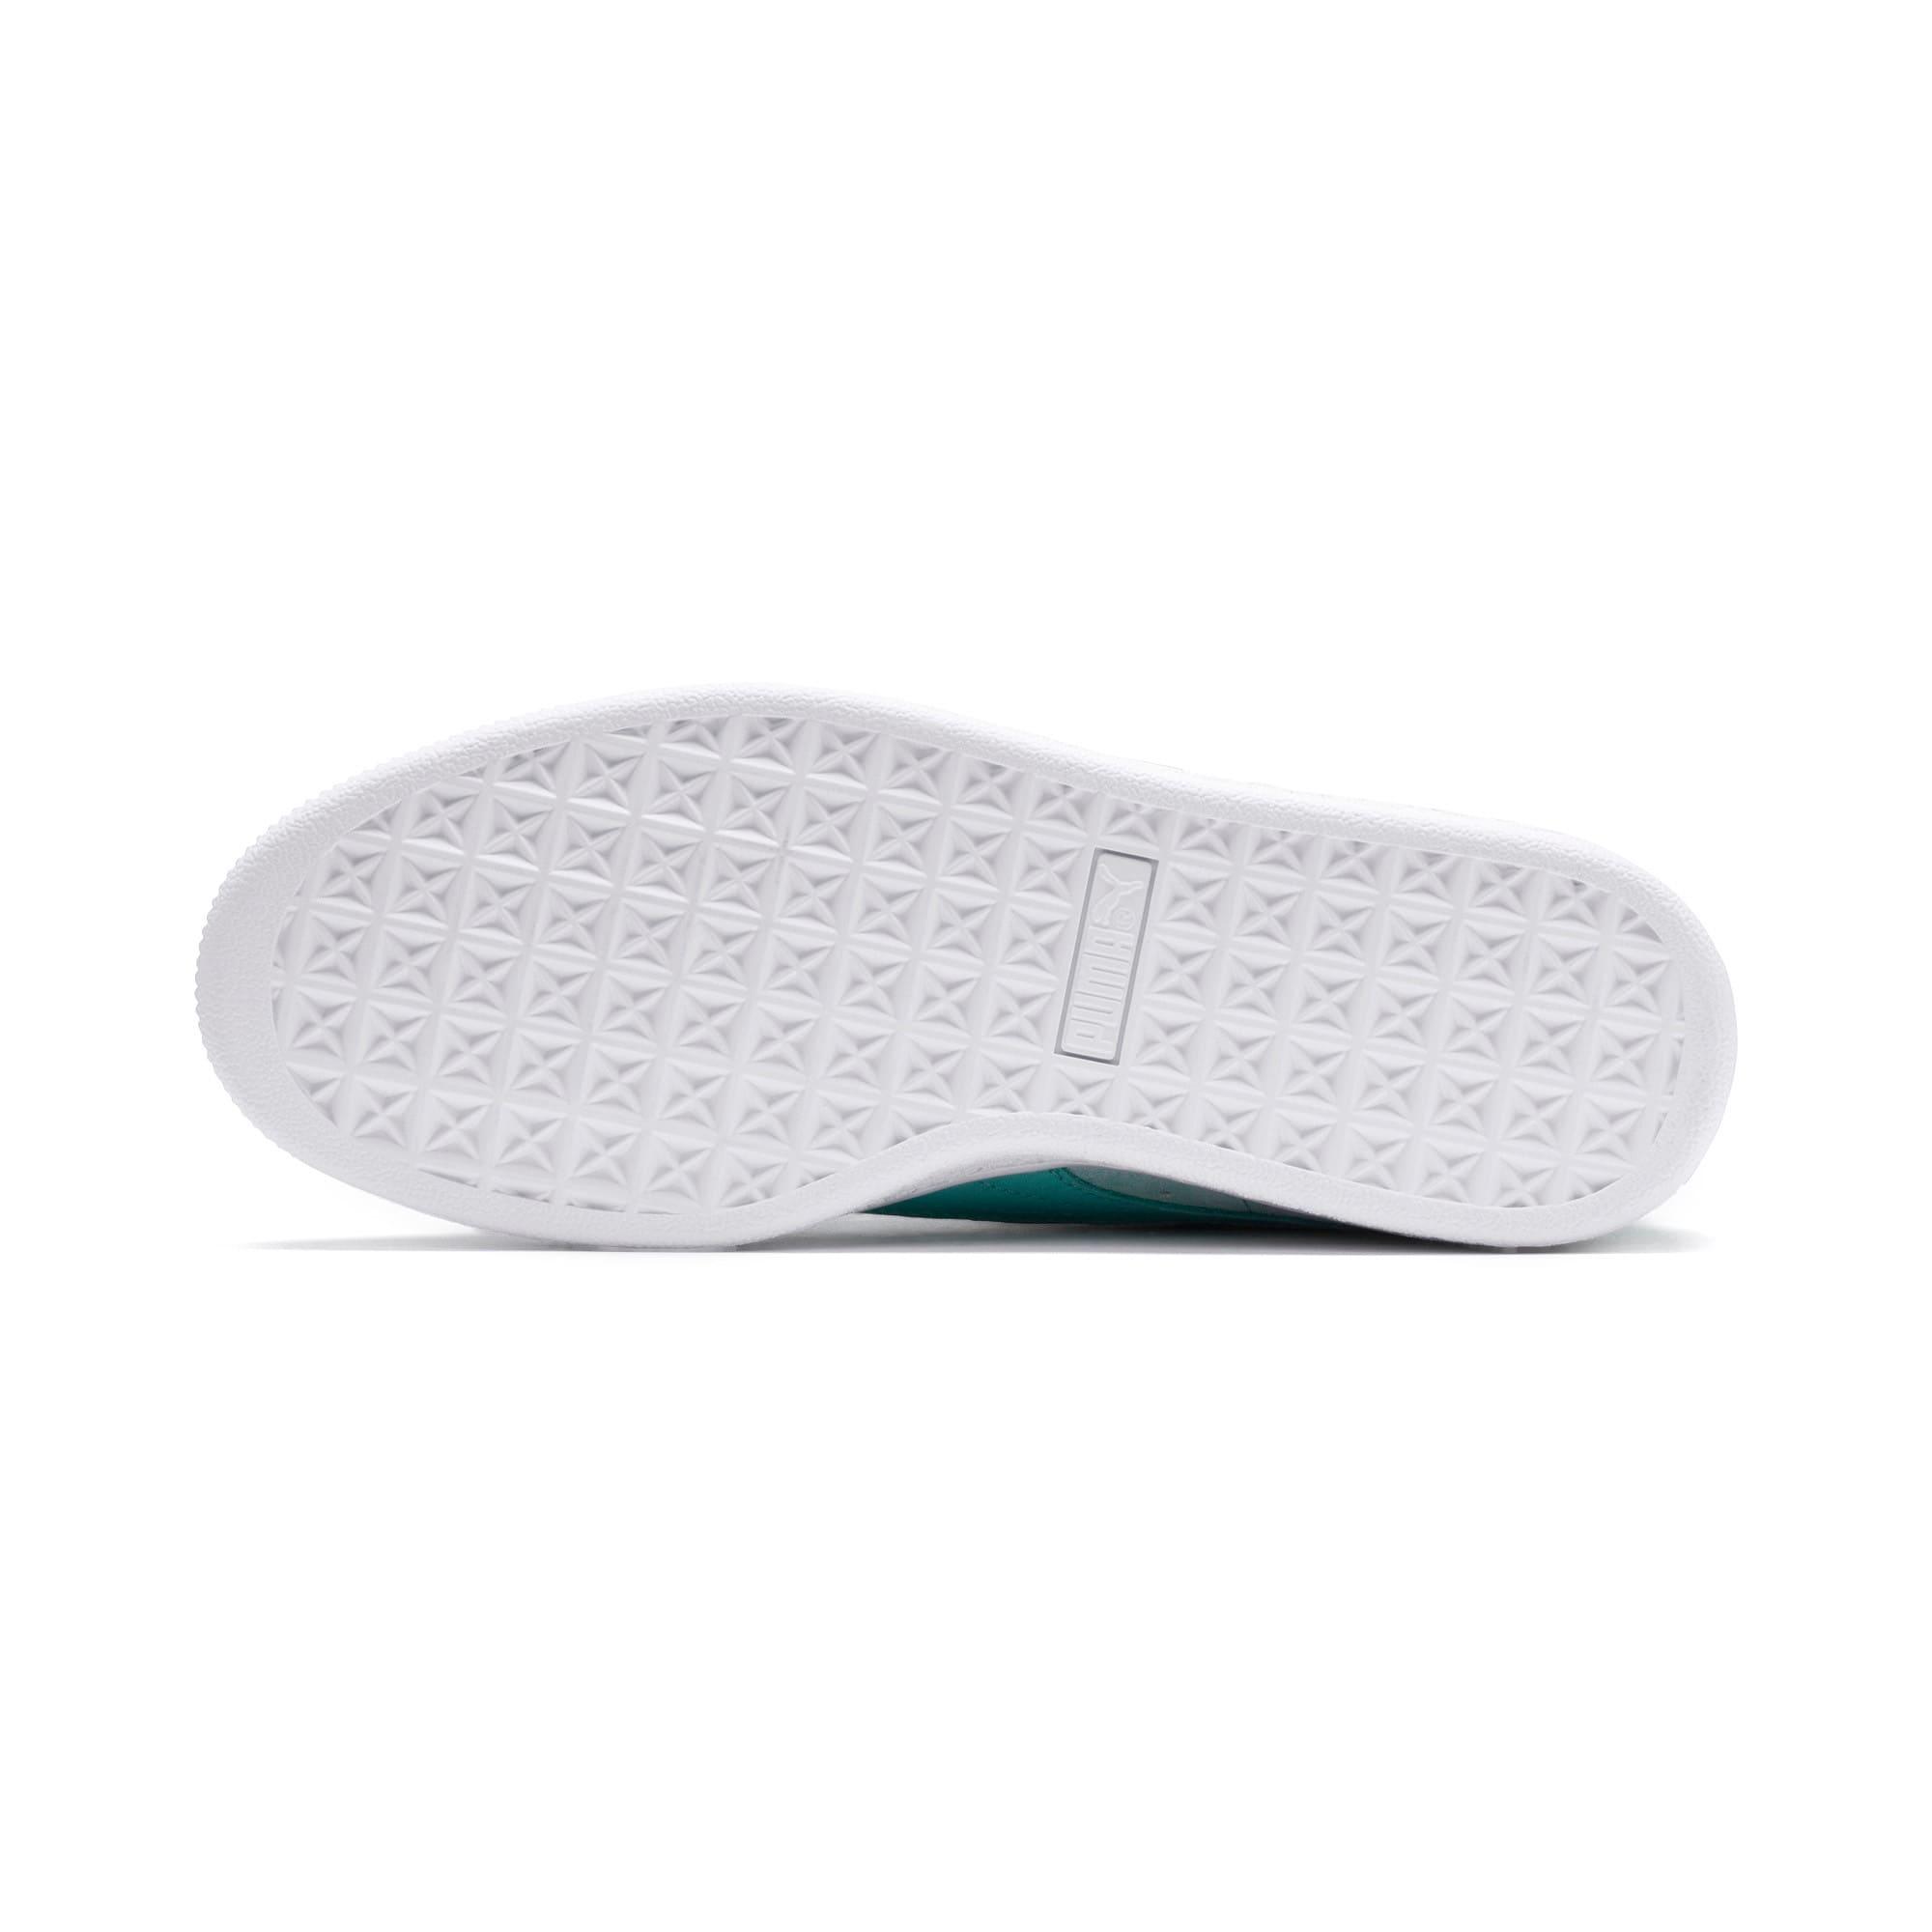 Miniatura 3 de Zapatos deportivosPUMA x DIAMOND SUPPLY CO. Suede JR, Diamond Blue-Diamond Blue, mediano